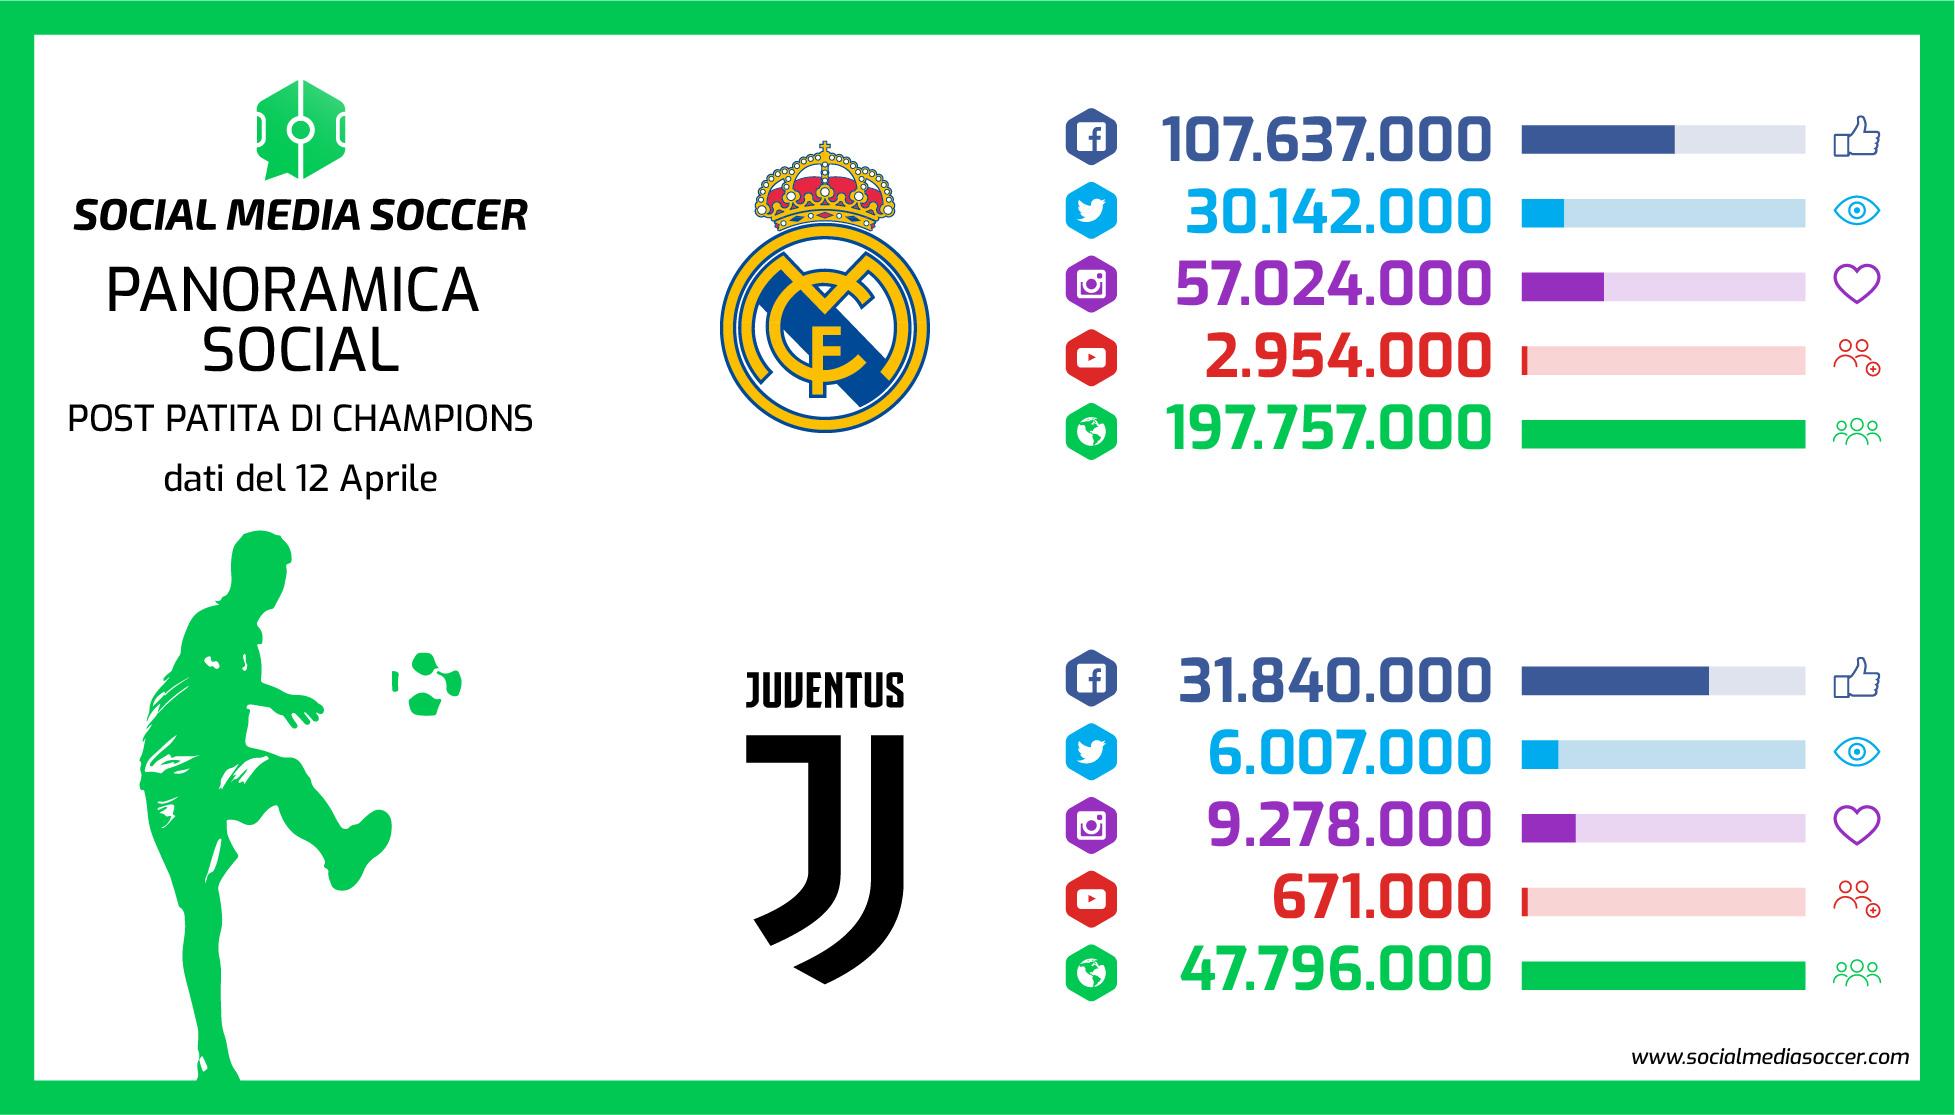 Social Ritorno quarti Champions League 2017/2018 Real Madrid - Juventus